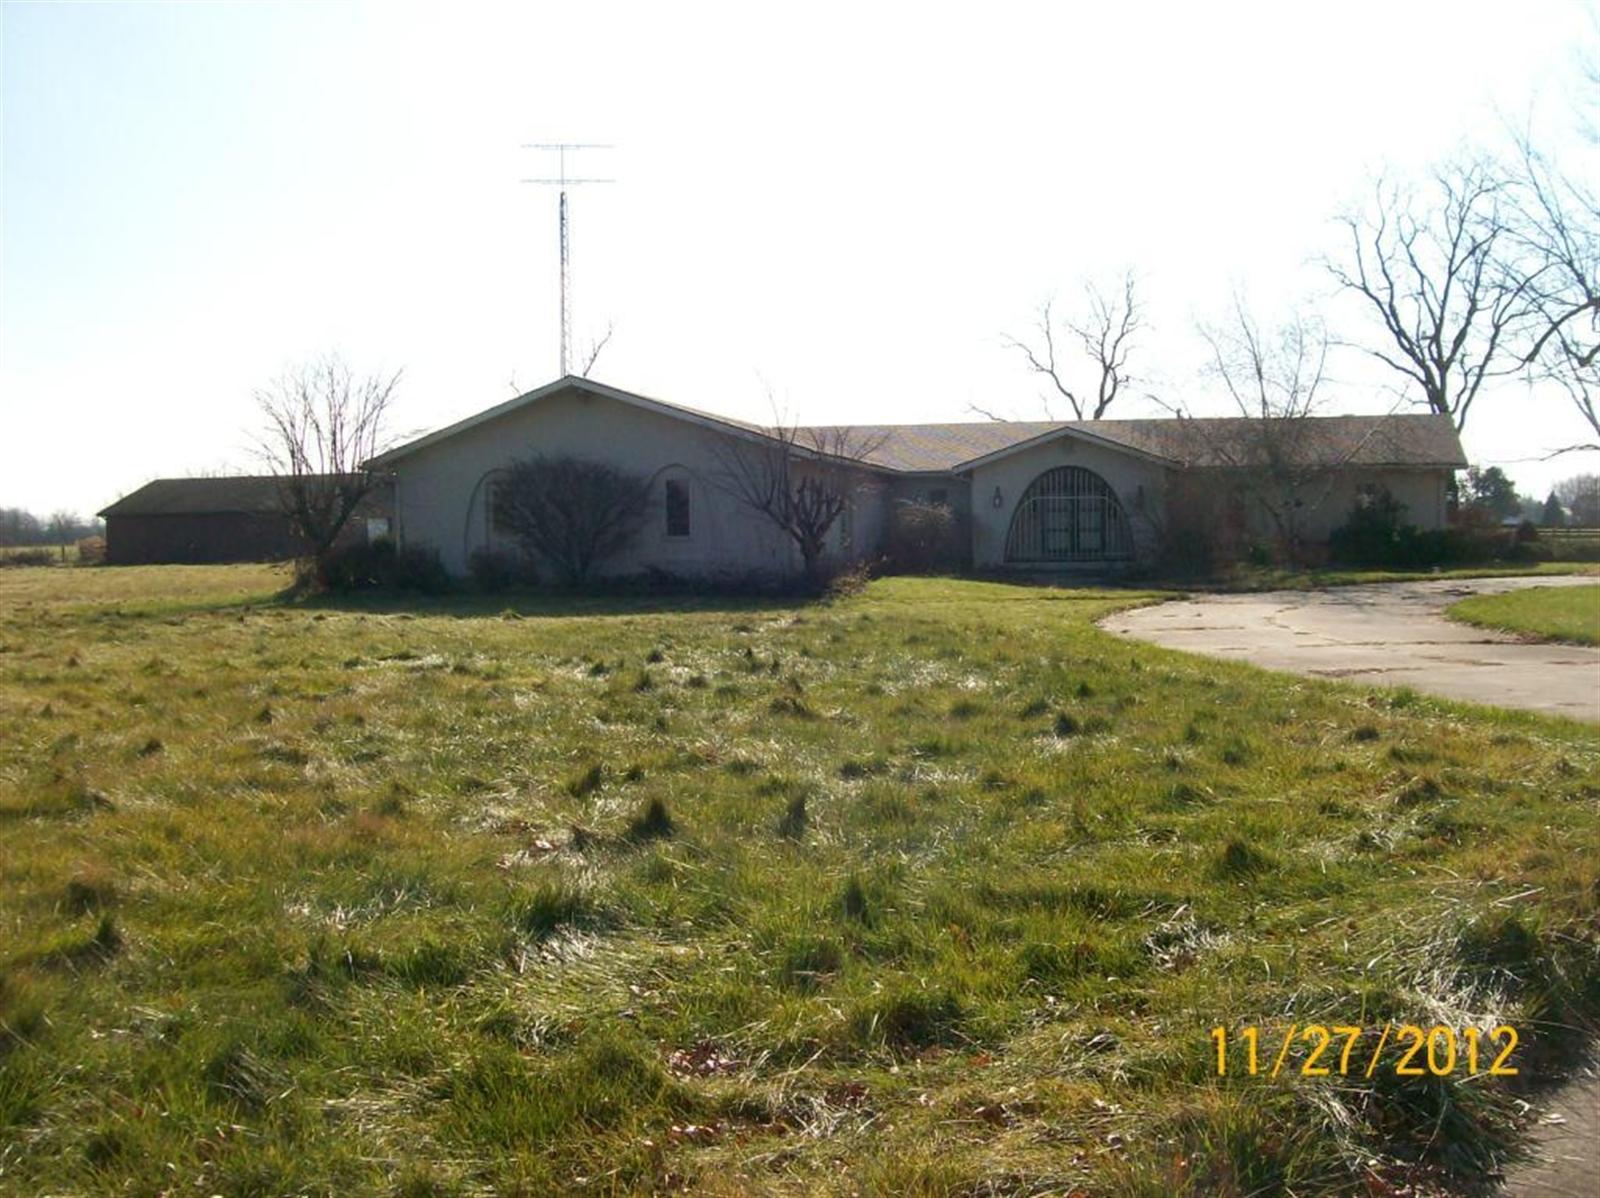 Real Estate Photography - 3077 E SR 236, ANDERSON, IN, 46011 - Location 1